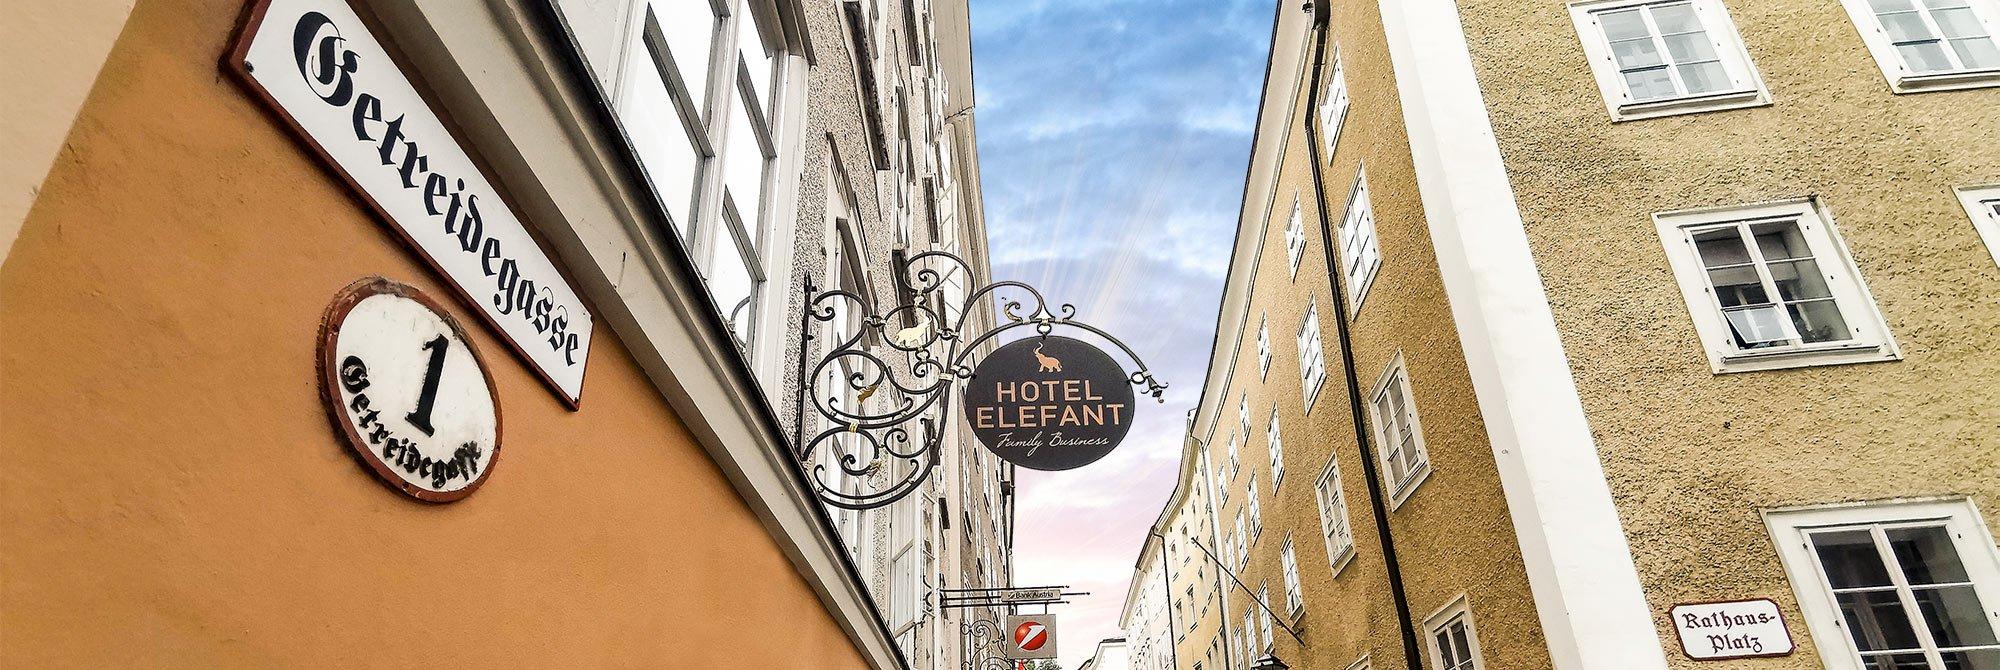 Hotel Elefant Family Business Getreidegasse 1